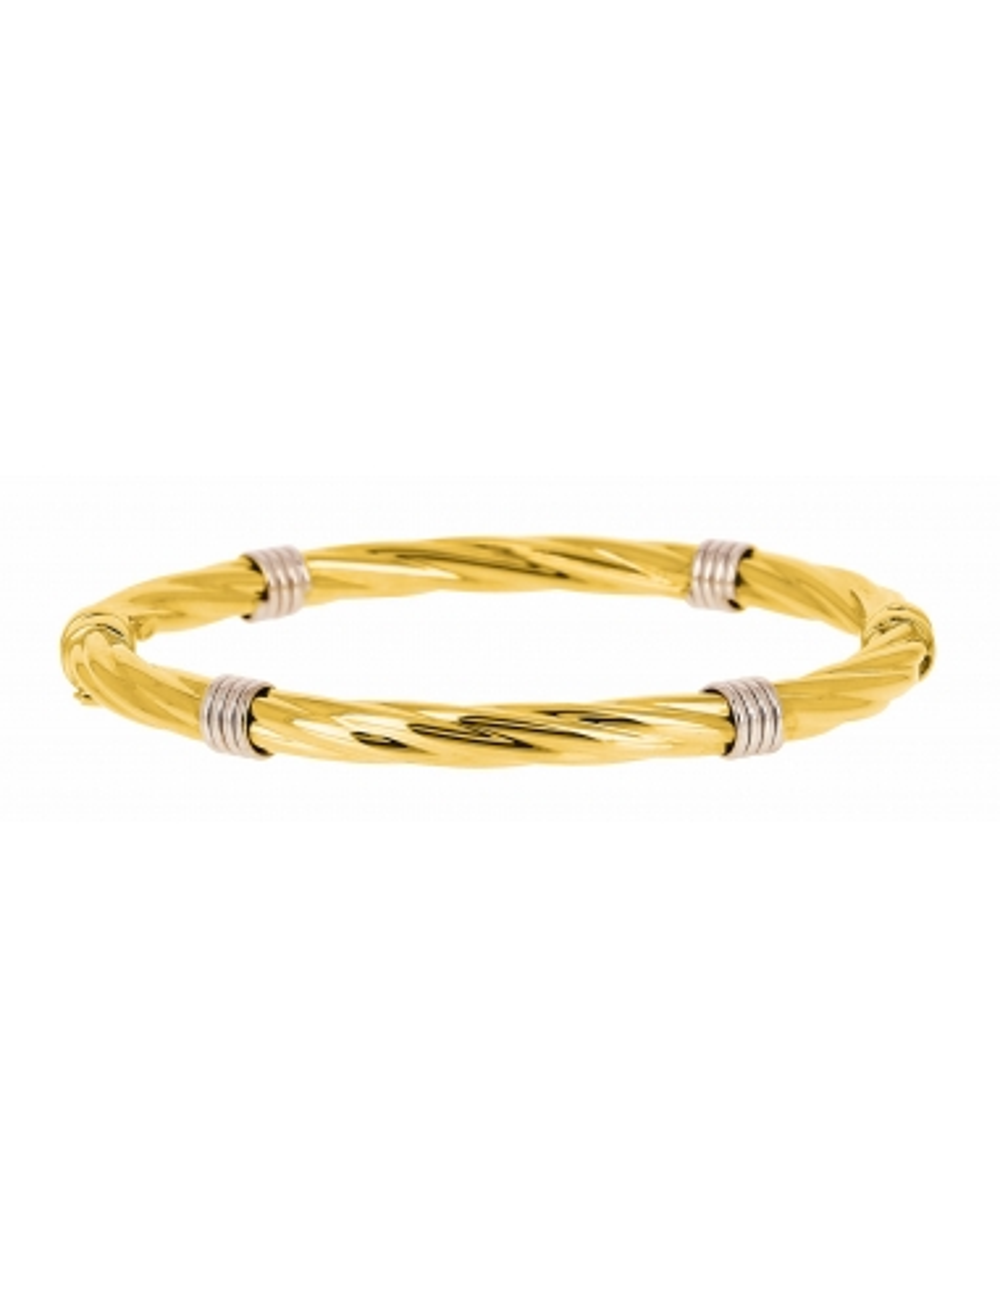 Bracelet Jonc Rigide 2 Ors Torsadé 18 carats